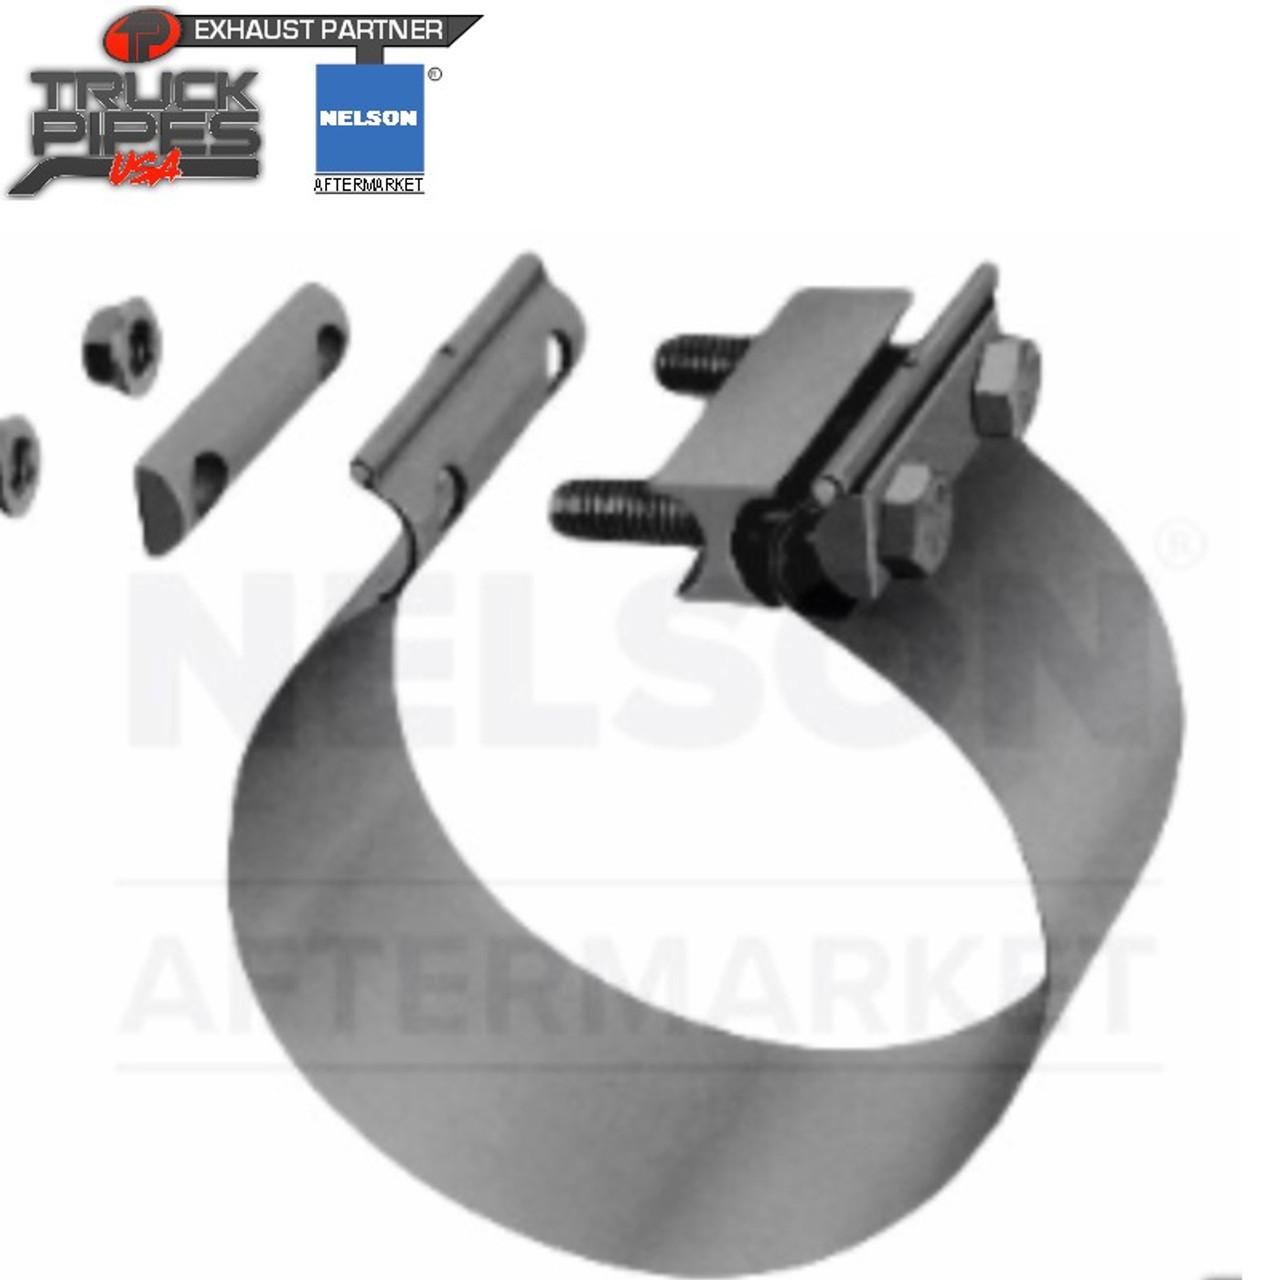 "4"" Torctite Butt Joint Exhaust Clamp Aluminized Nelson 90376A"